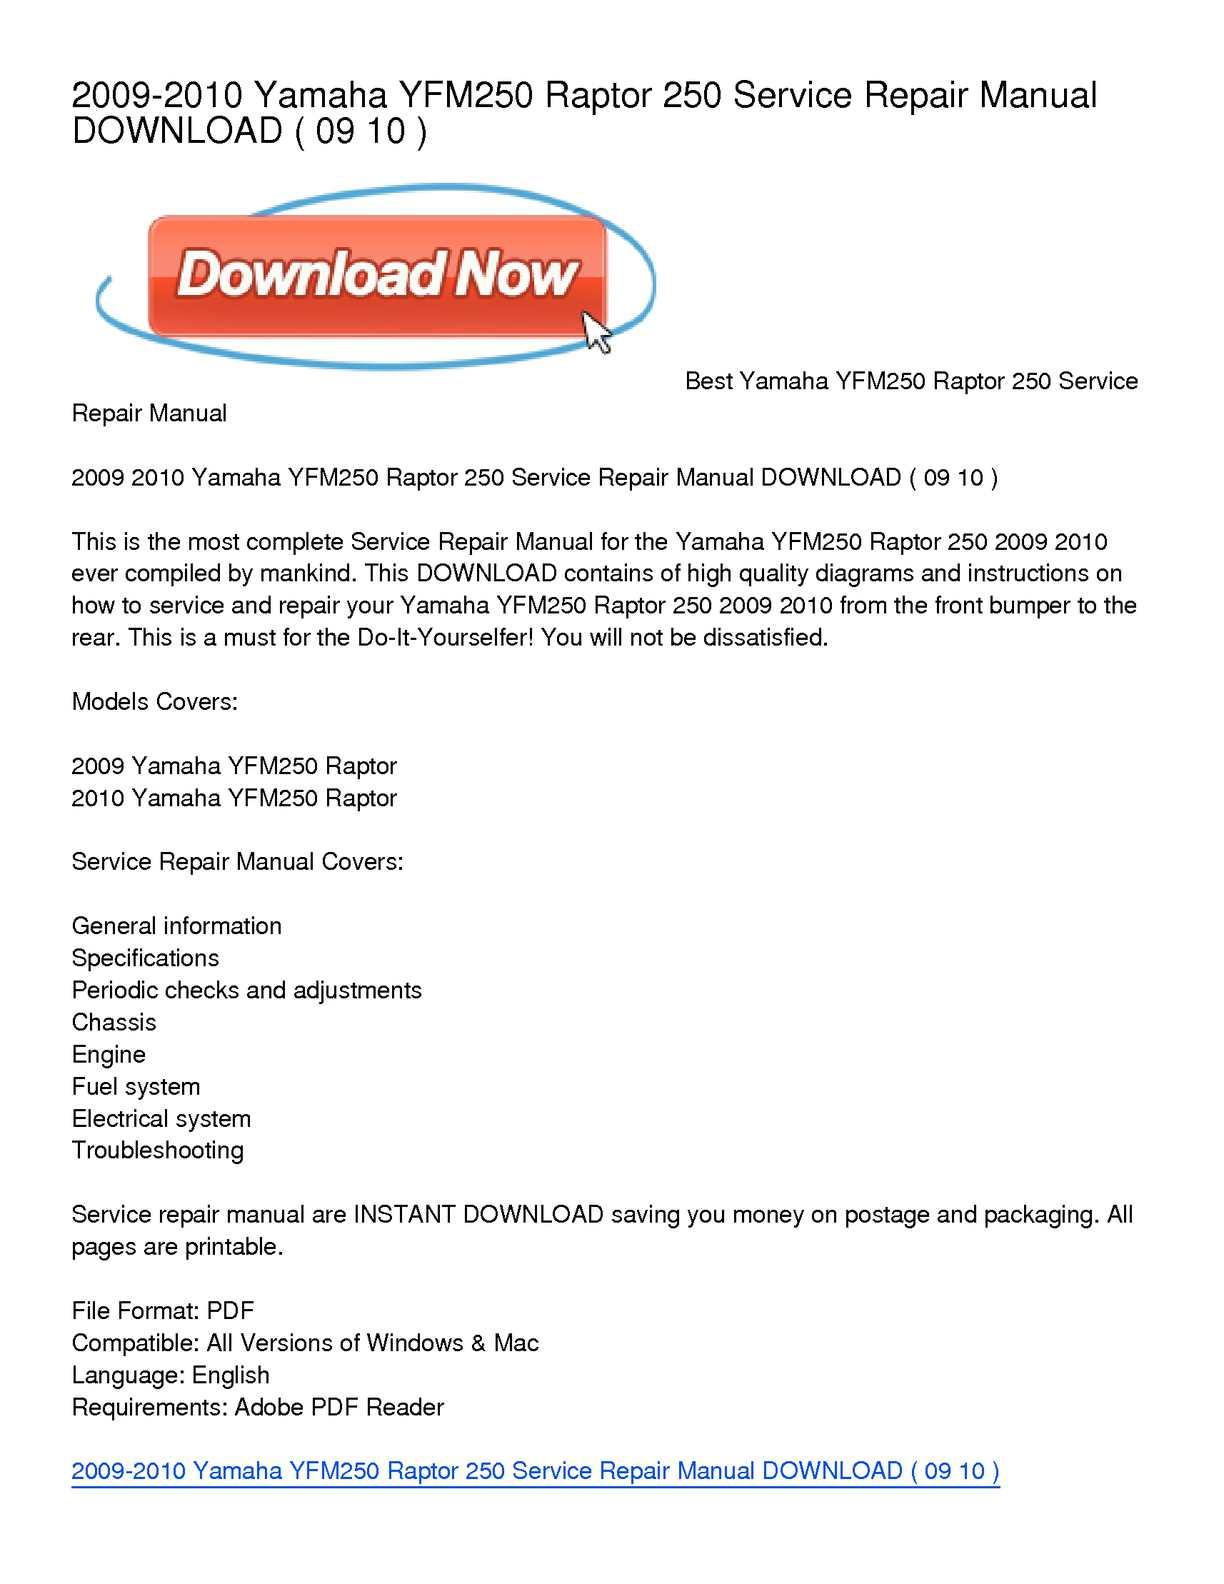 Calamo 2009 2010 Yamaha Yfm250 Raptor 250 Service Repair Manual Yfm Wiring Diagram Free Picture Download